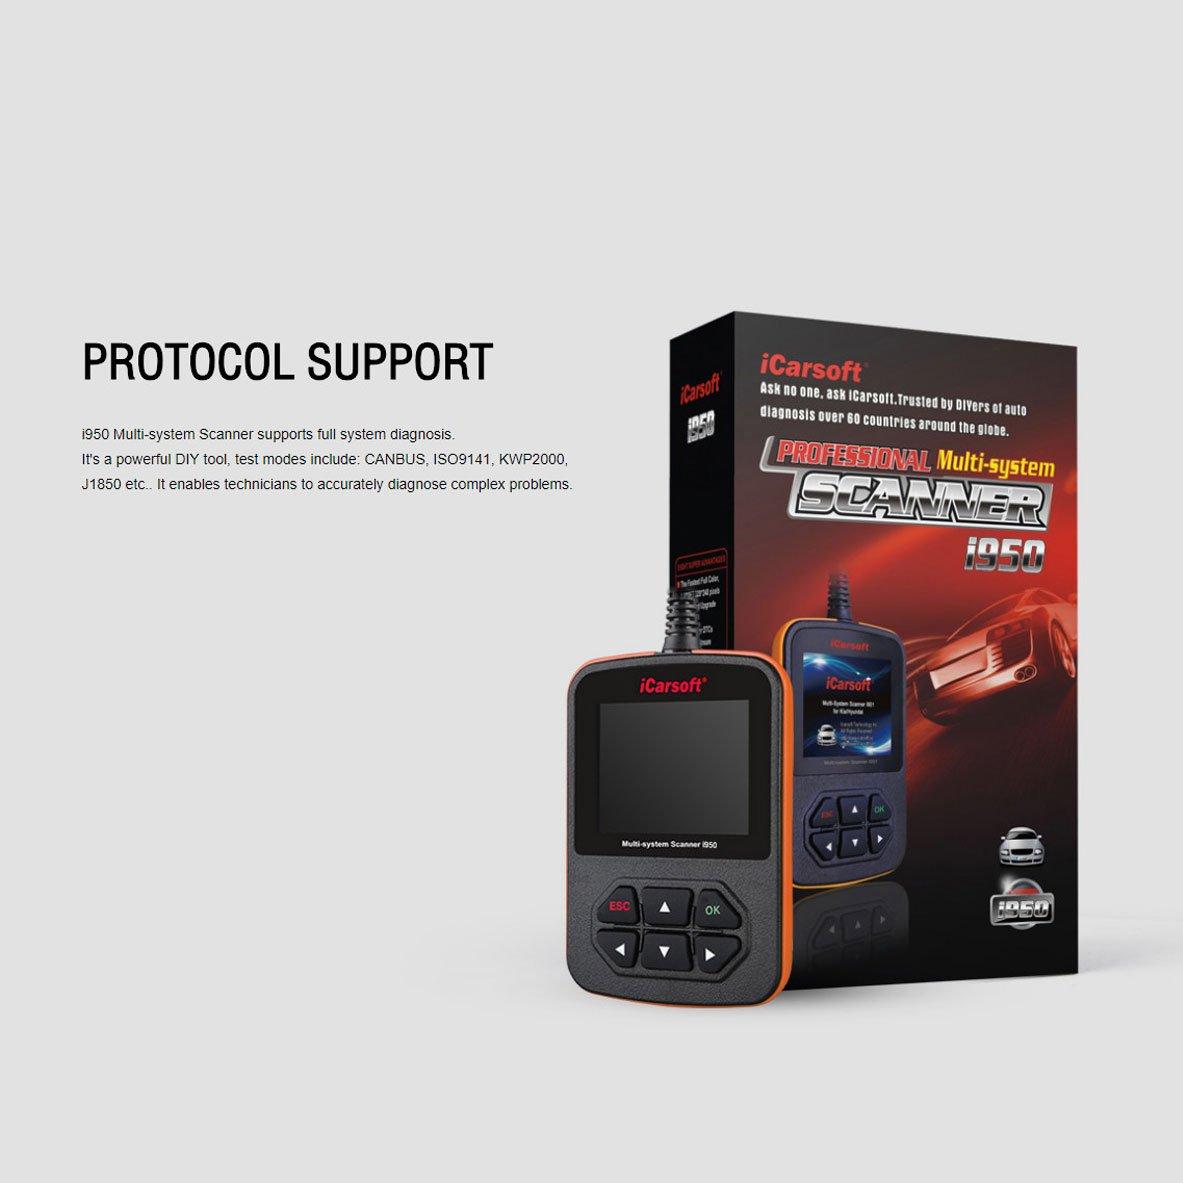 Amazon.com: FIAT and ALFA ROMEO OBD2 DIAGNOSTIC SCANNER TOOL ERASE FAULT CODES - iCARSOFT i950: Automotive